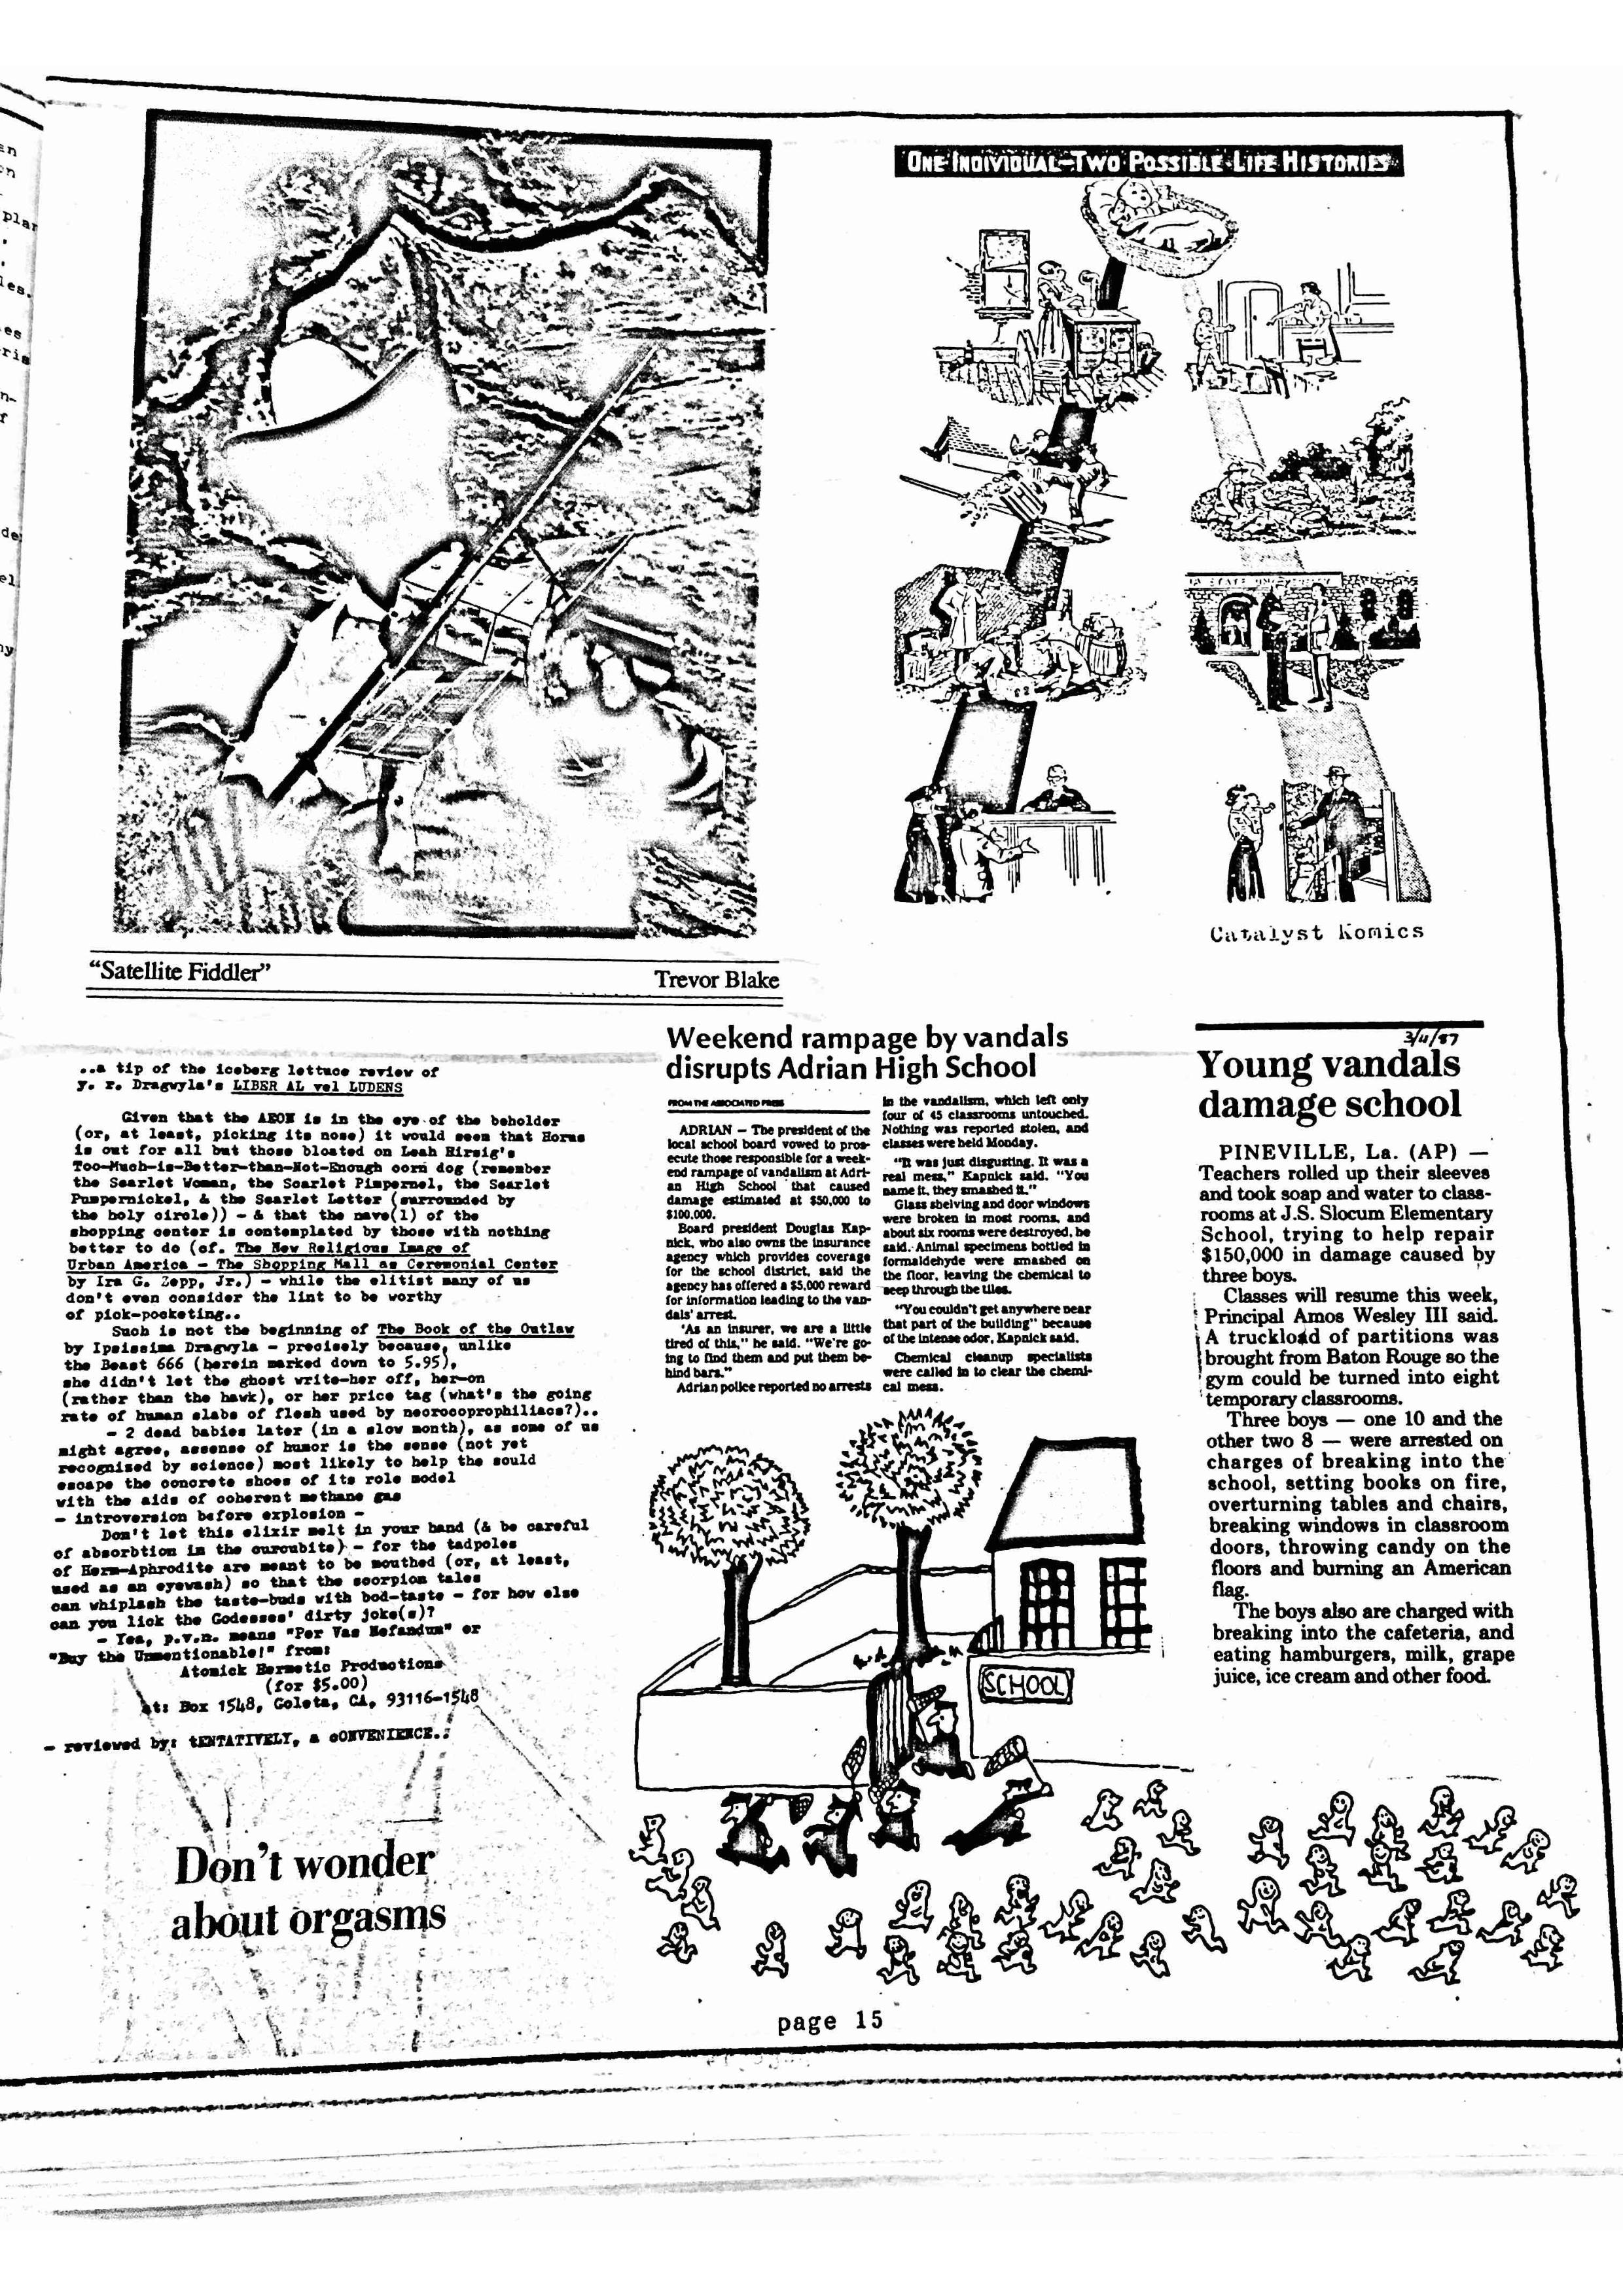 PopRealLast2-page-001.jpg